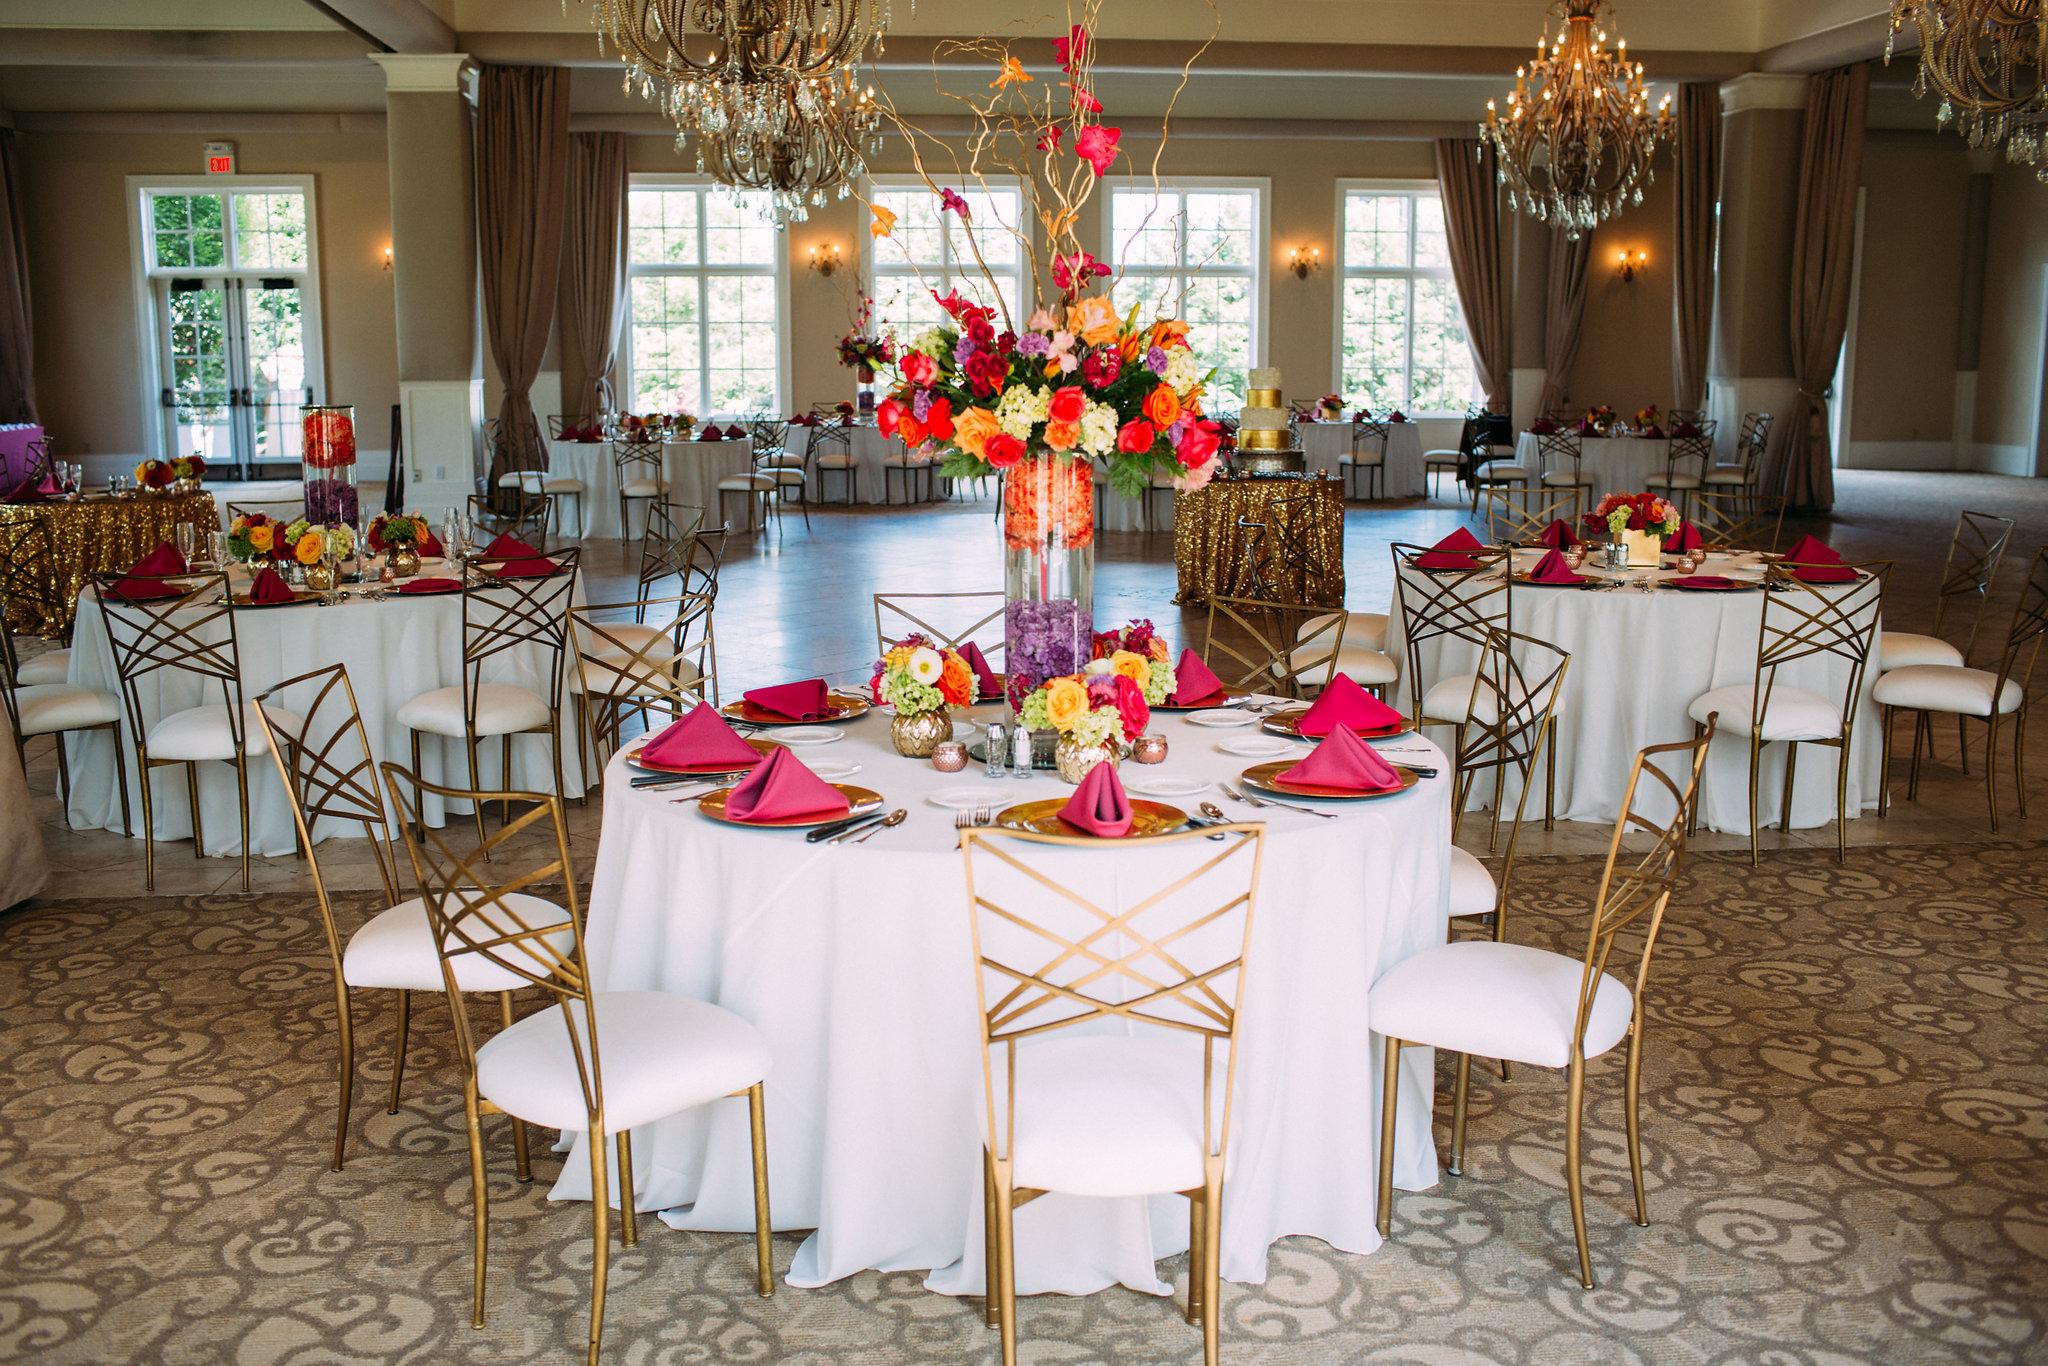 Romantic & bright wedding reception